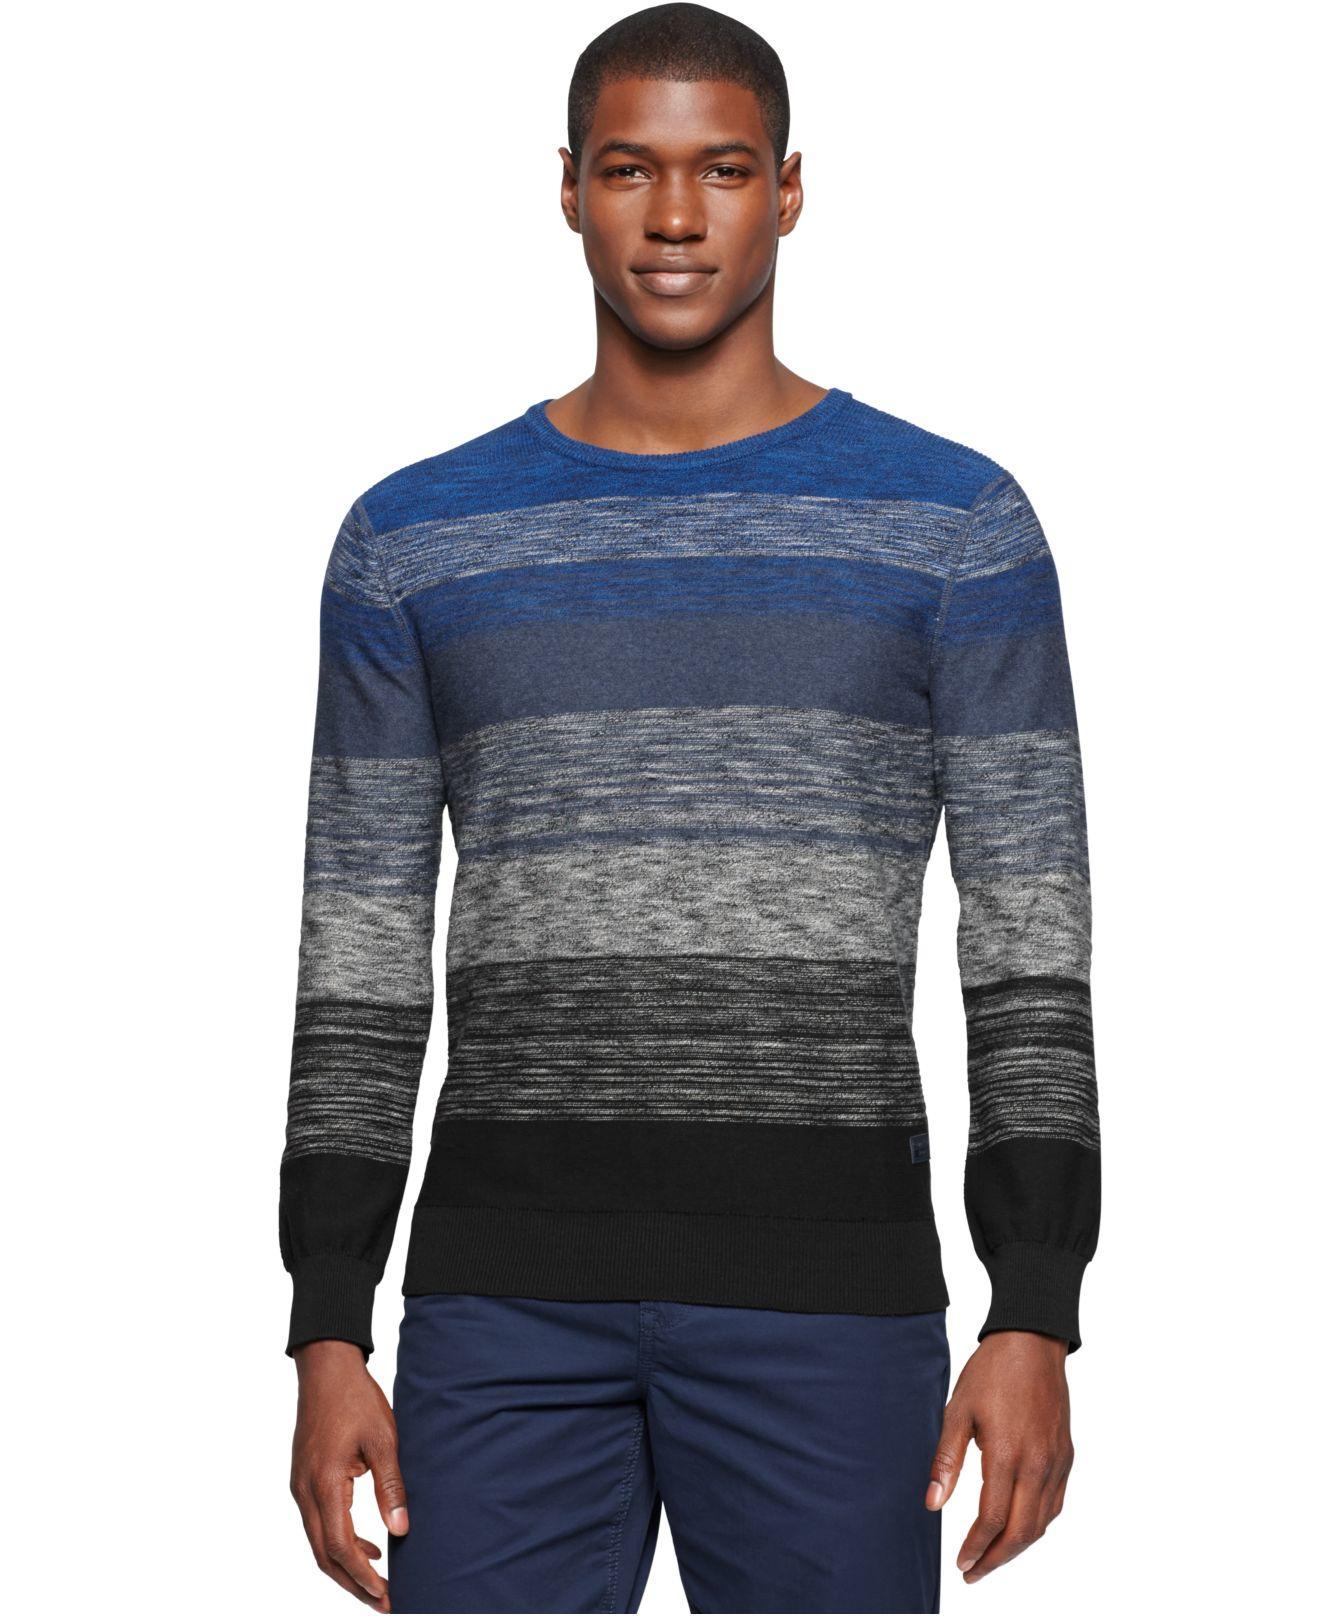 calvin klein jeans ombre colorblock stripe sweater in gray. Black Bedroom Furniture Sets. Home Design Ideas